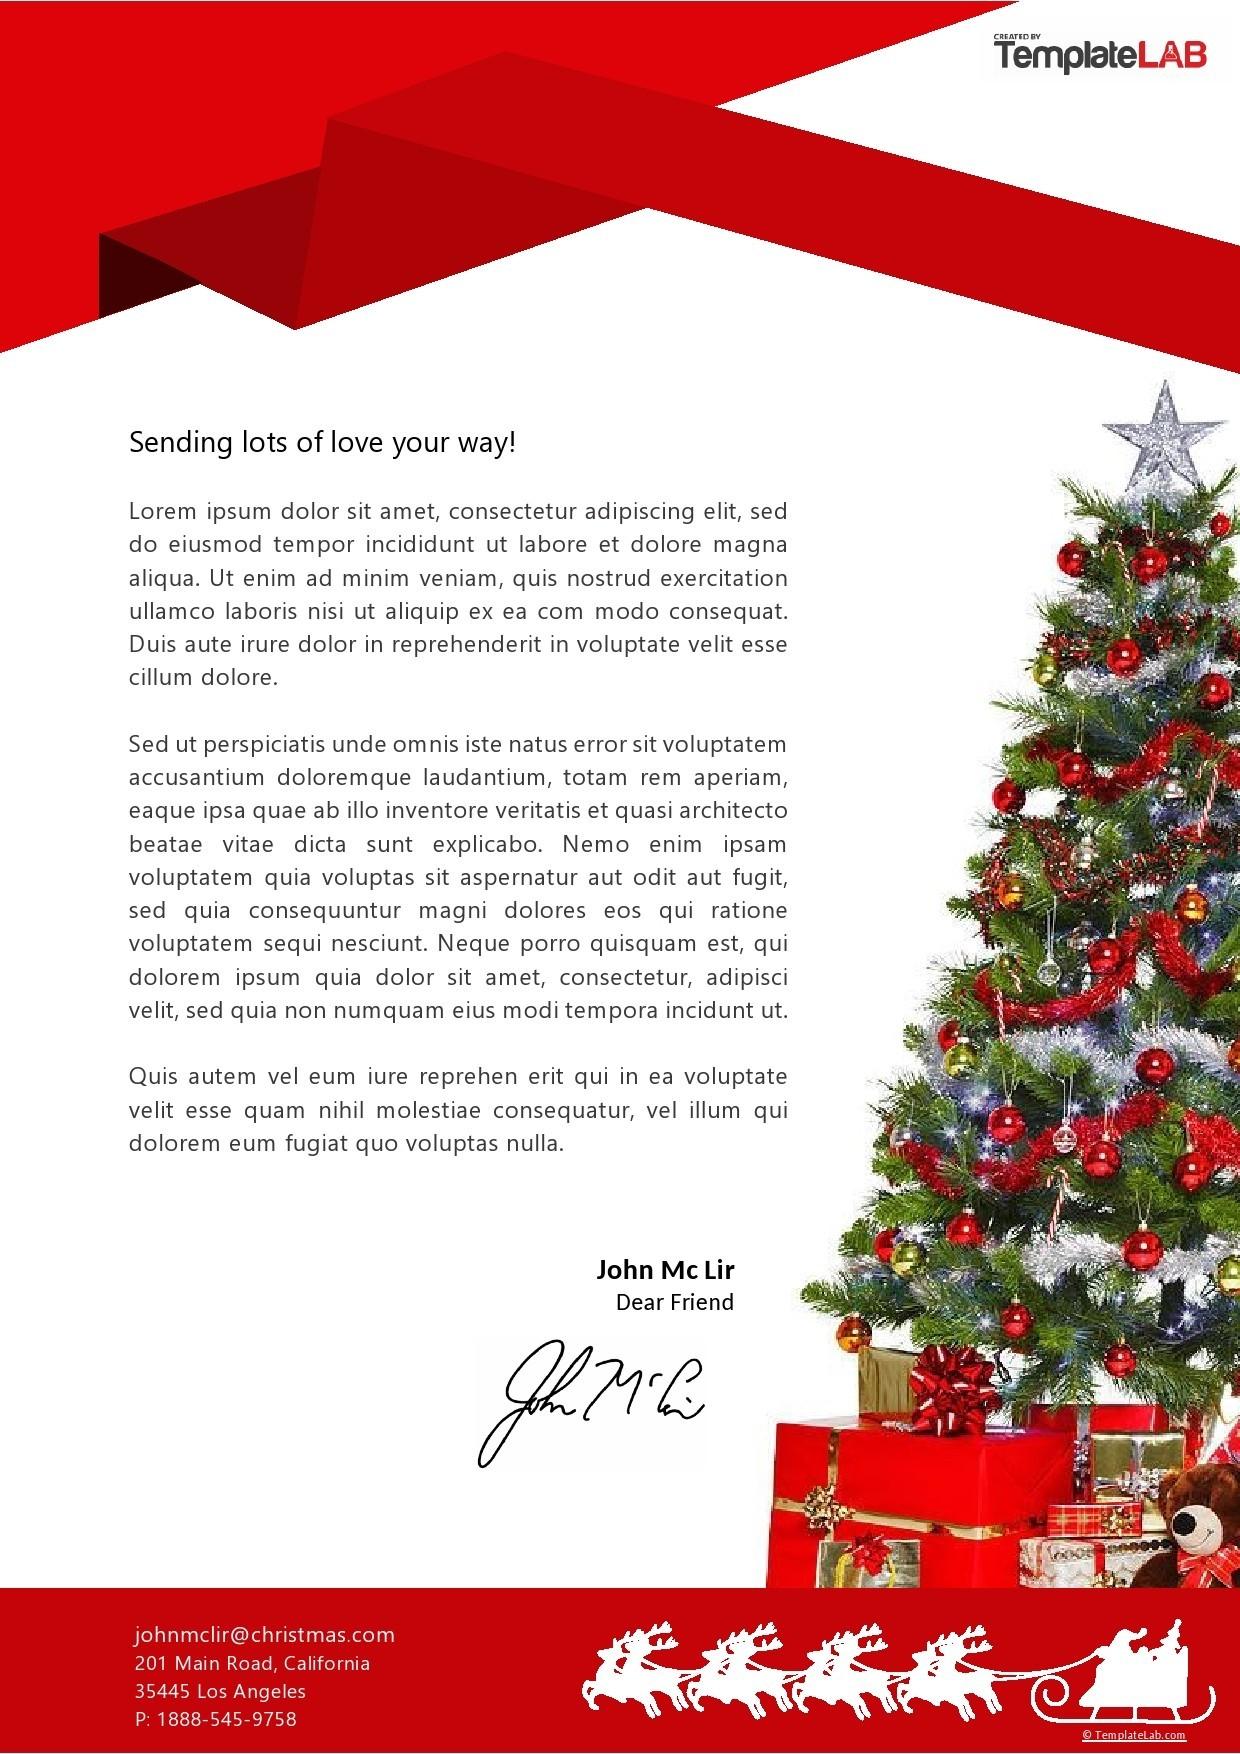 Free Christmas Letterhead Template - TemplateLab.com